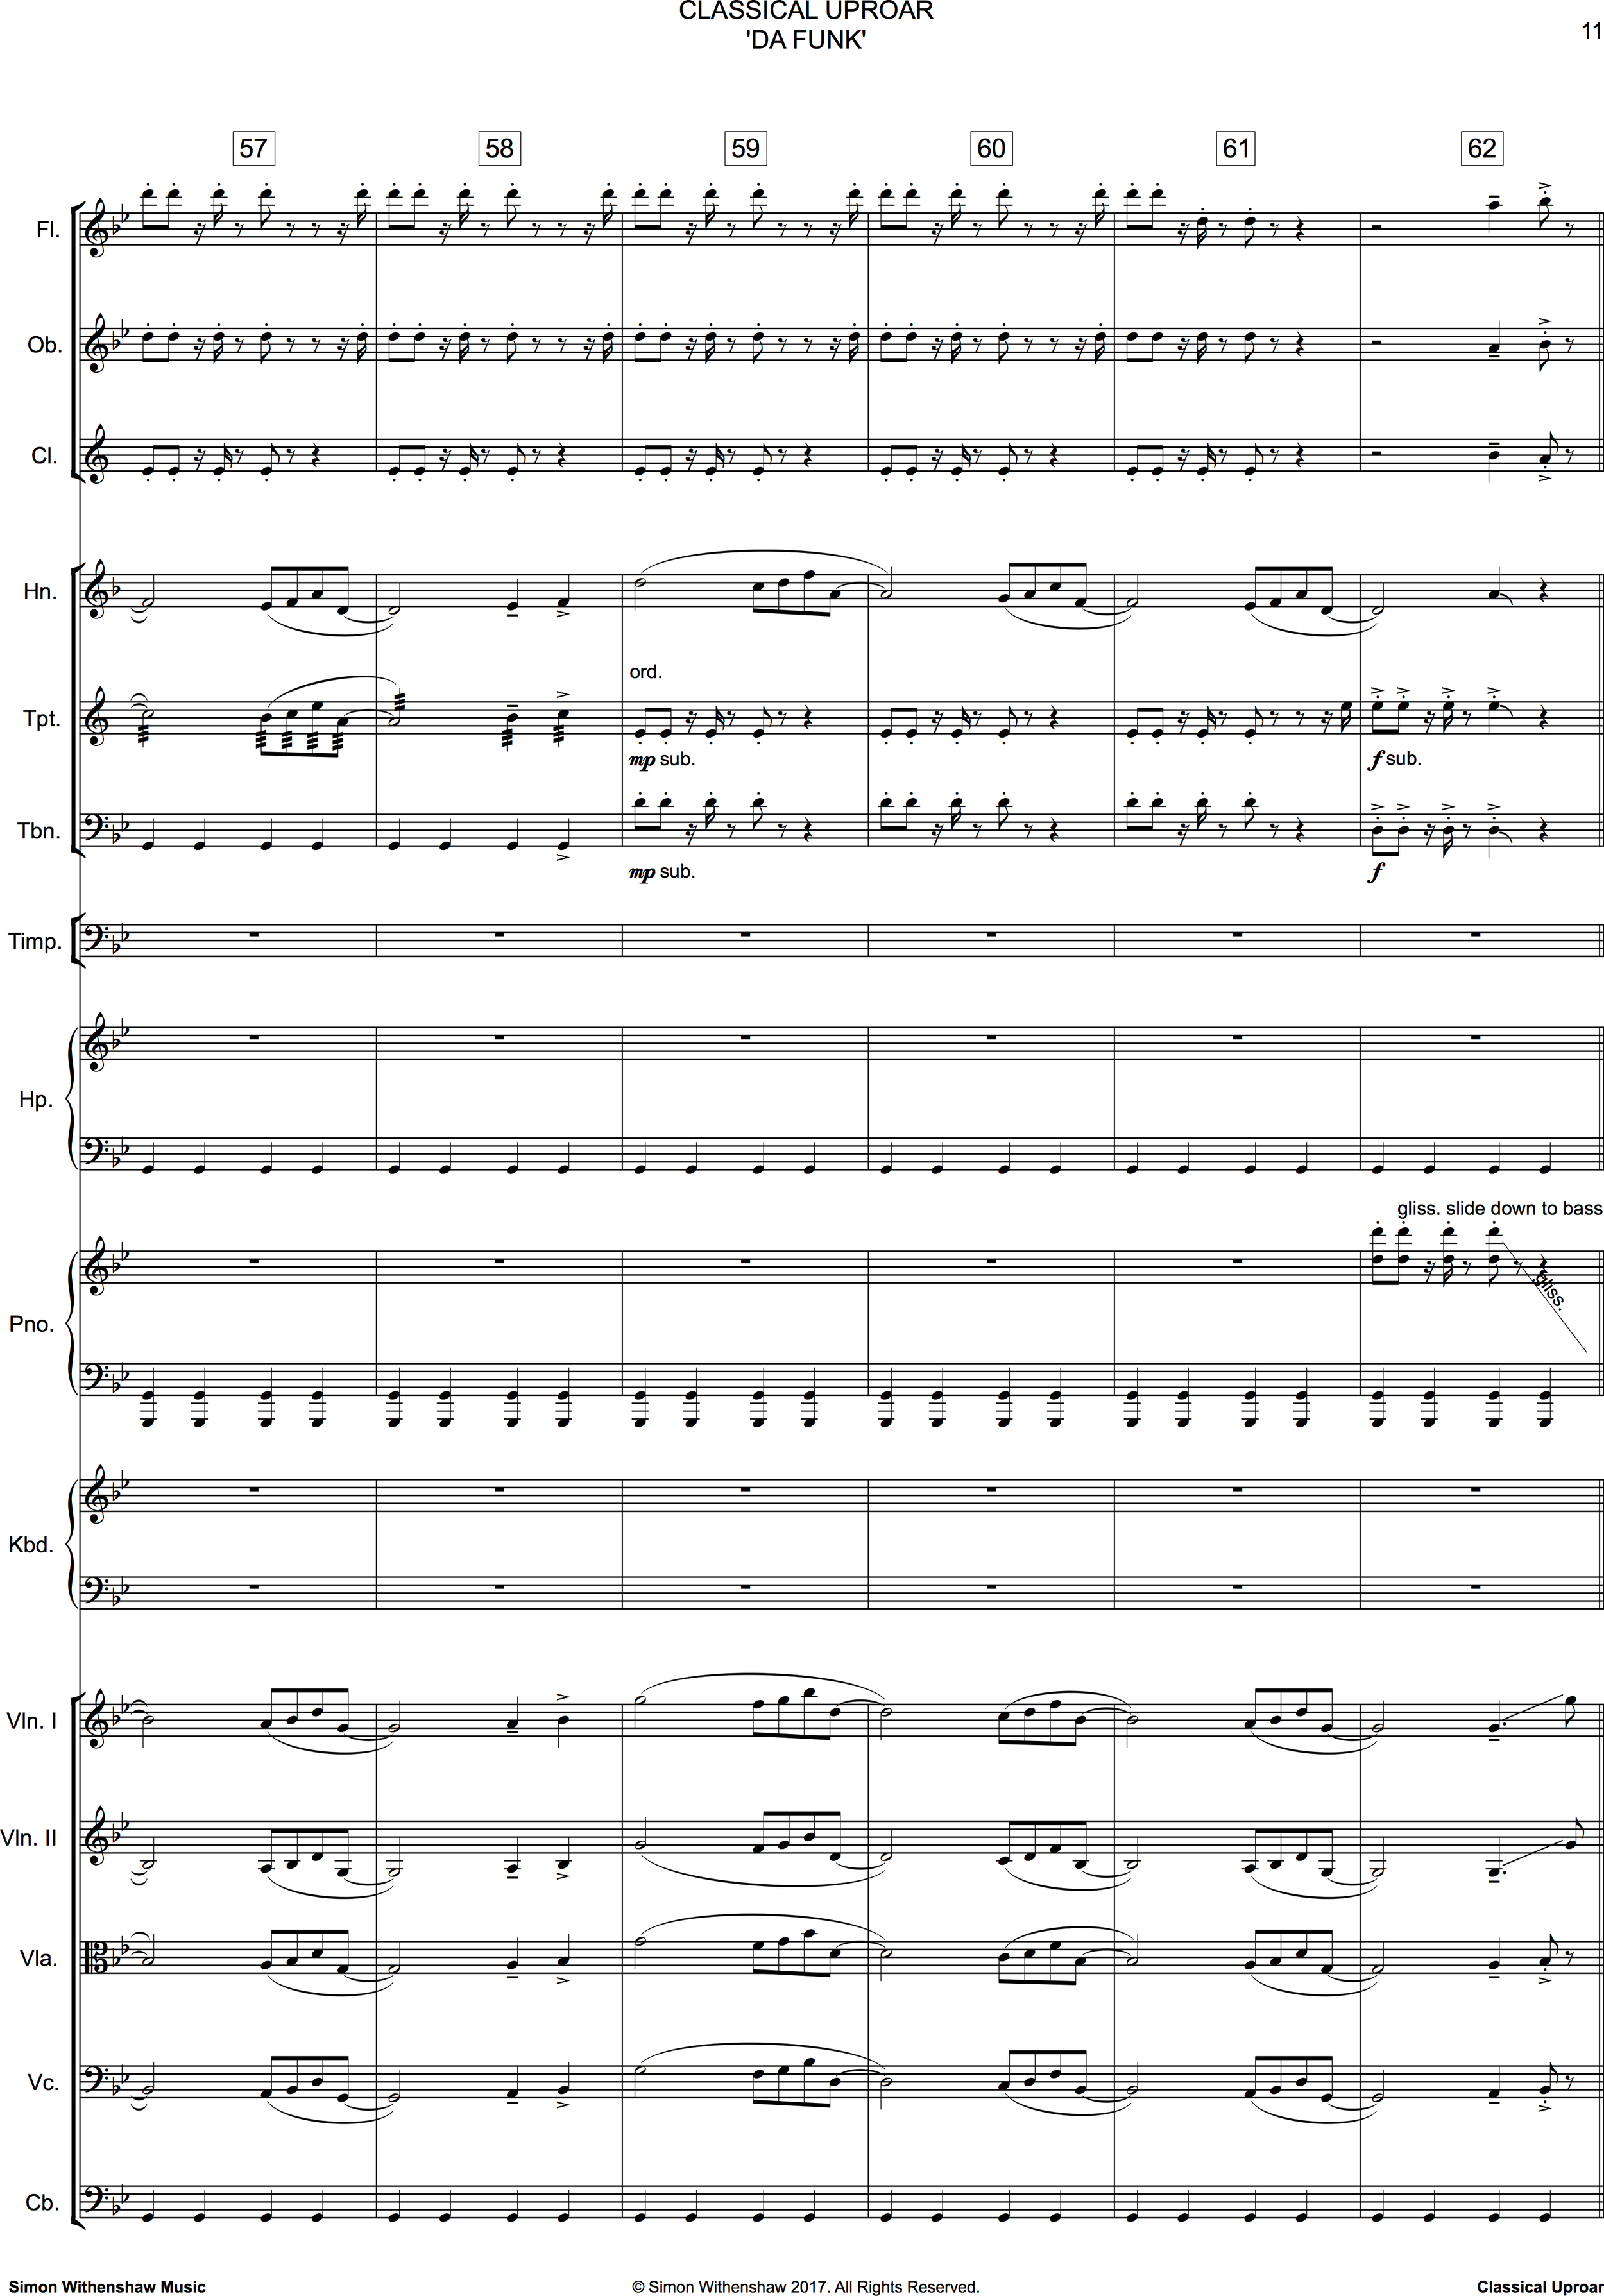 Da Funk - notes_0011.png